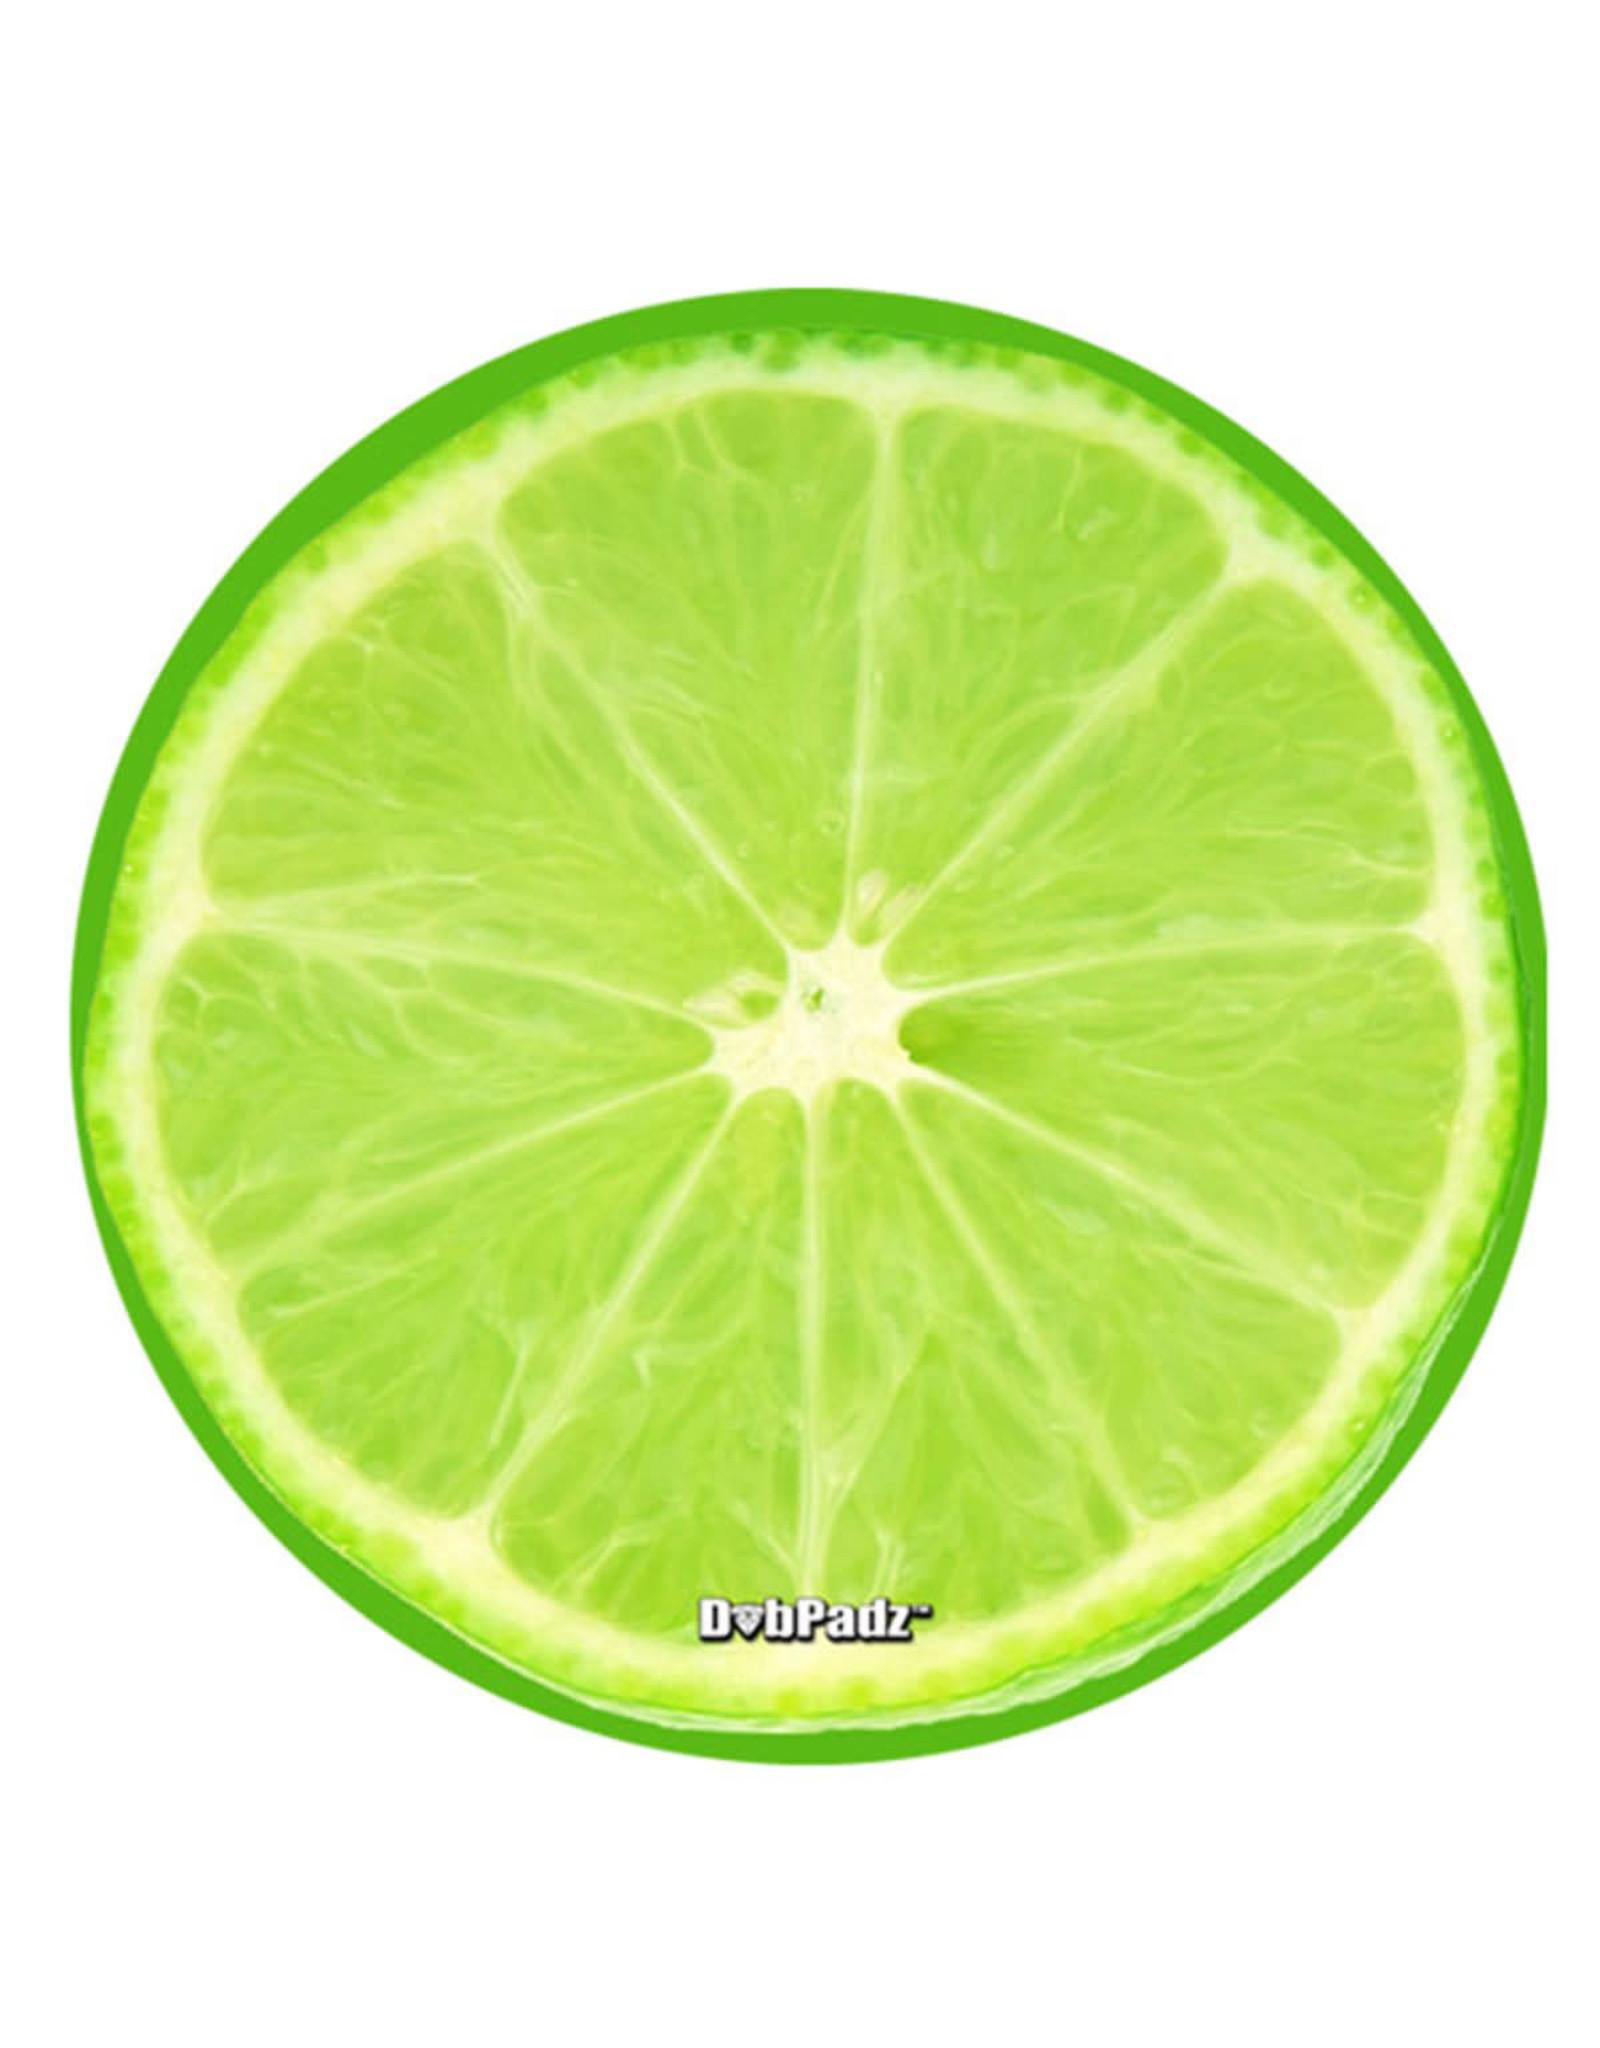 "DabPadz DabPadz Round Fabric Top 8"" Lime Slice"